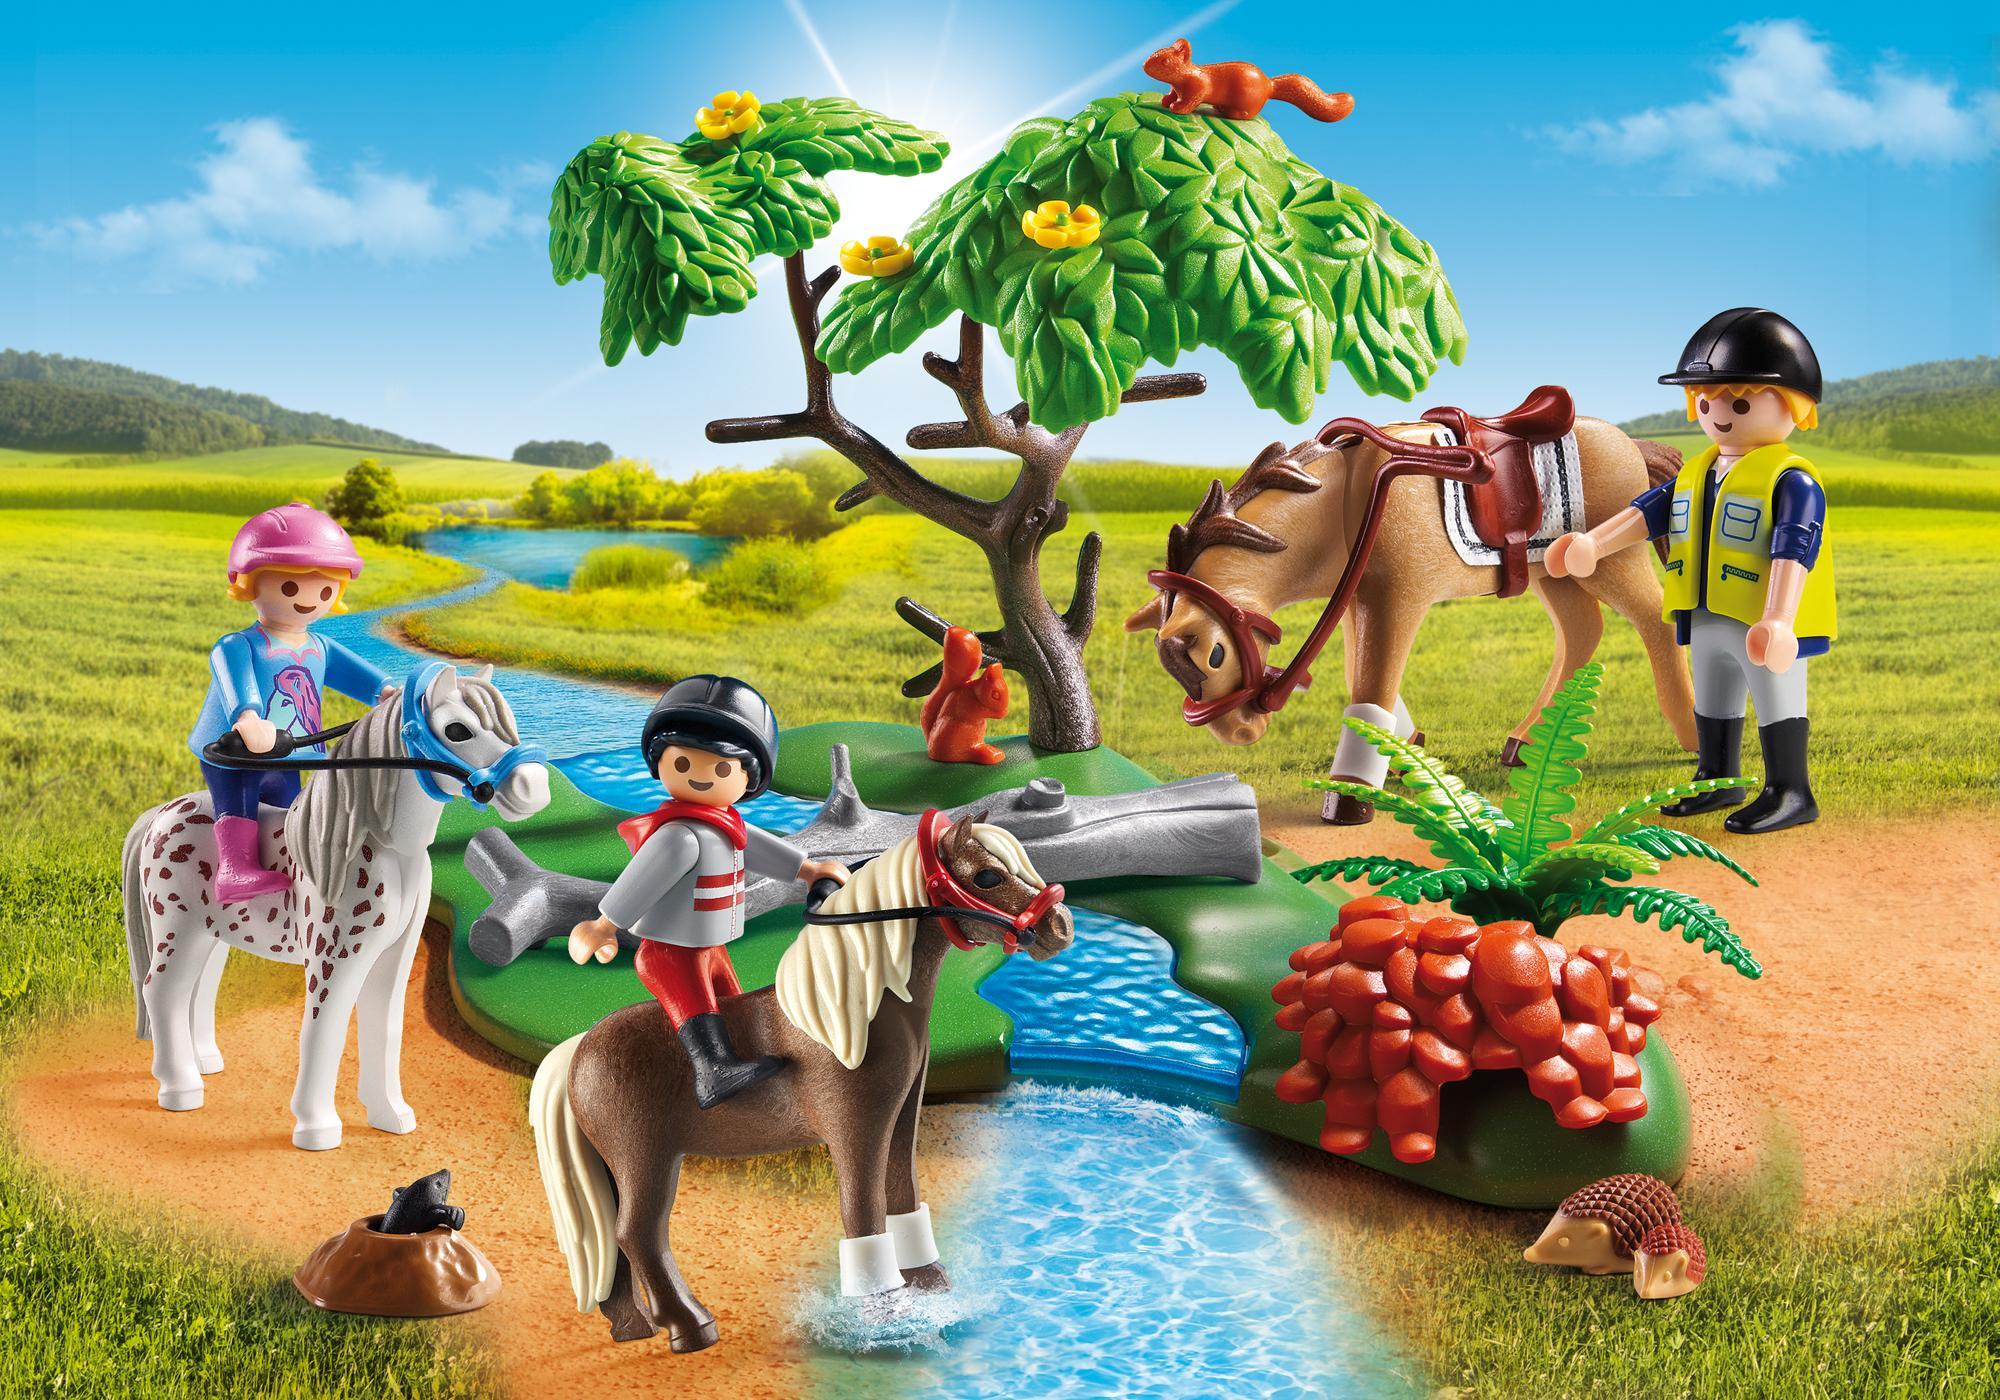 http://media.playmobil.com/i/playmobil/6947_product_detail/Παιδάκια με πόνυ και εκπαιδευτής με άλογο